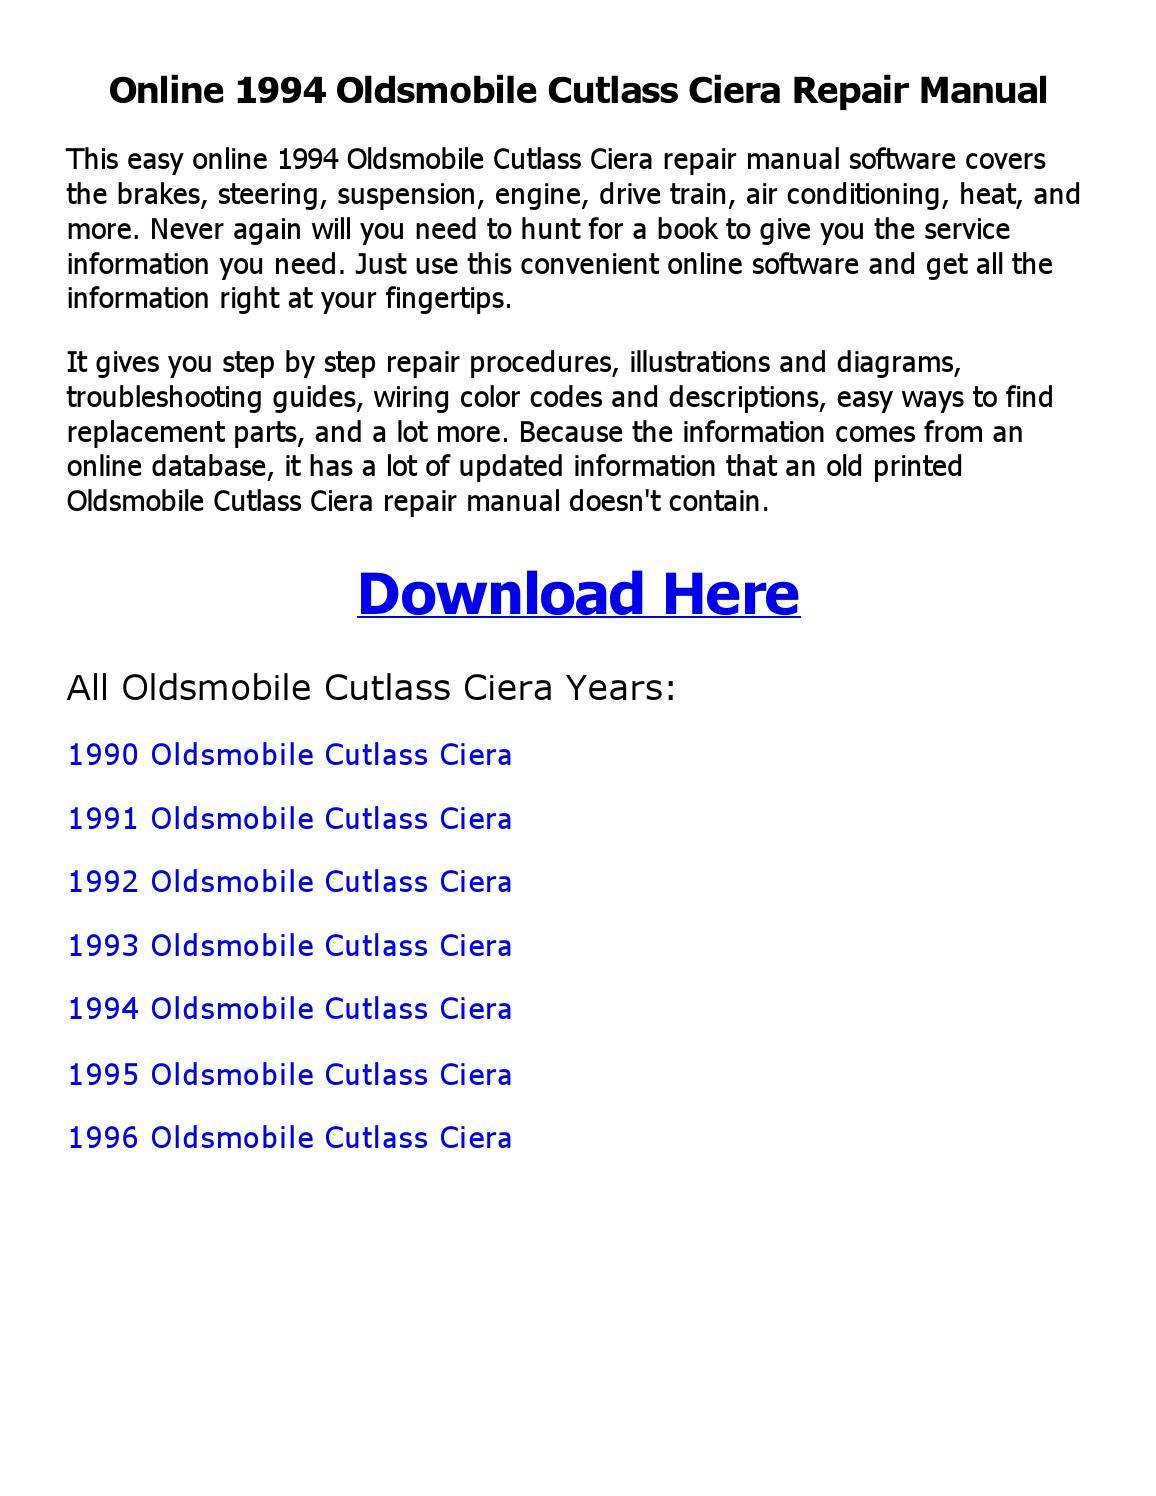 1994 Oldsmobile Cutlass Ciera Repair Manual Online By Sanod Saha Issuu 1993 Engine Diagram